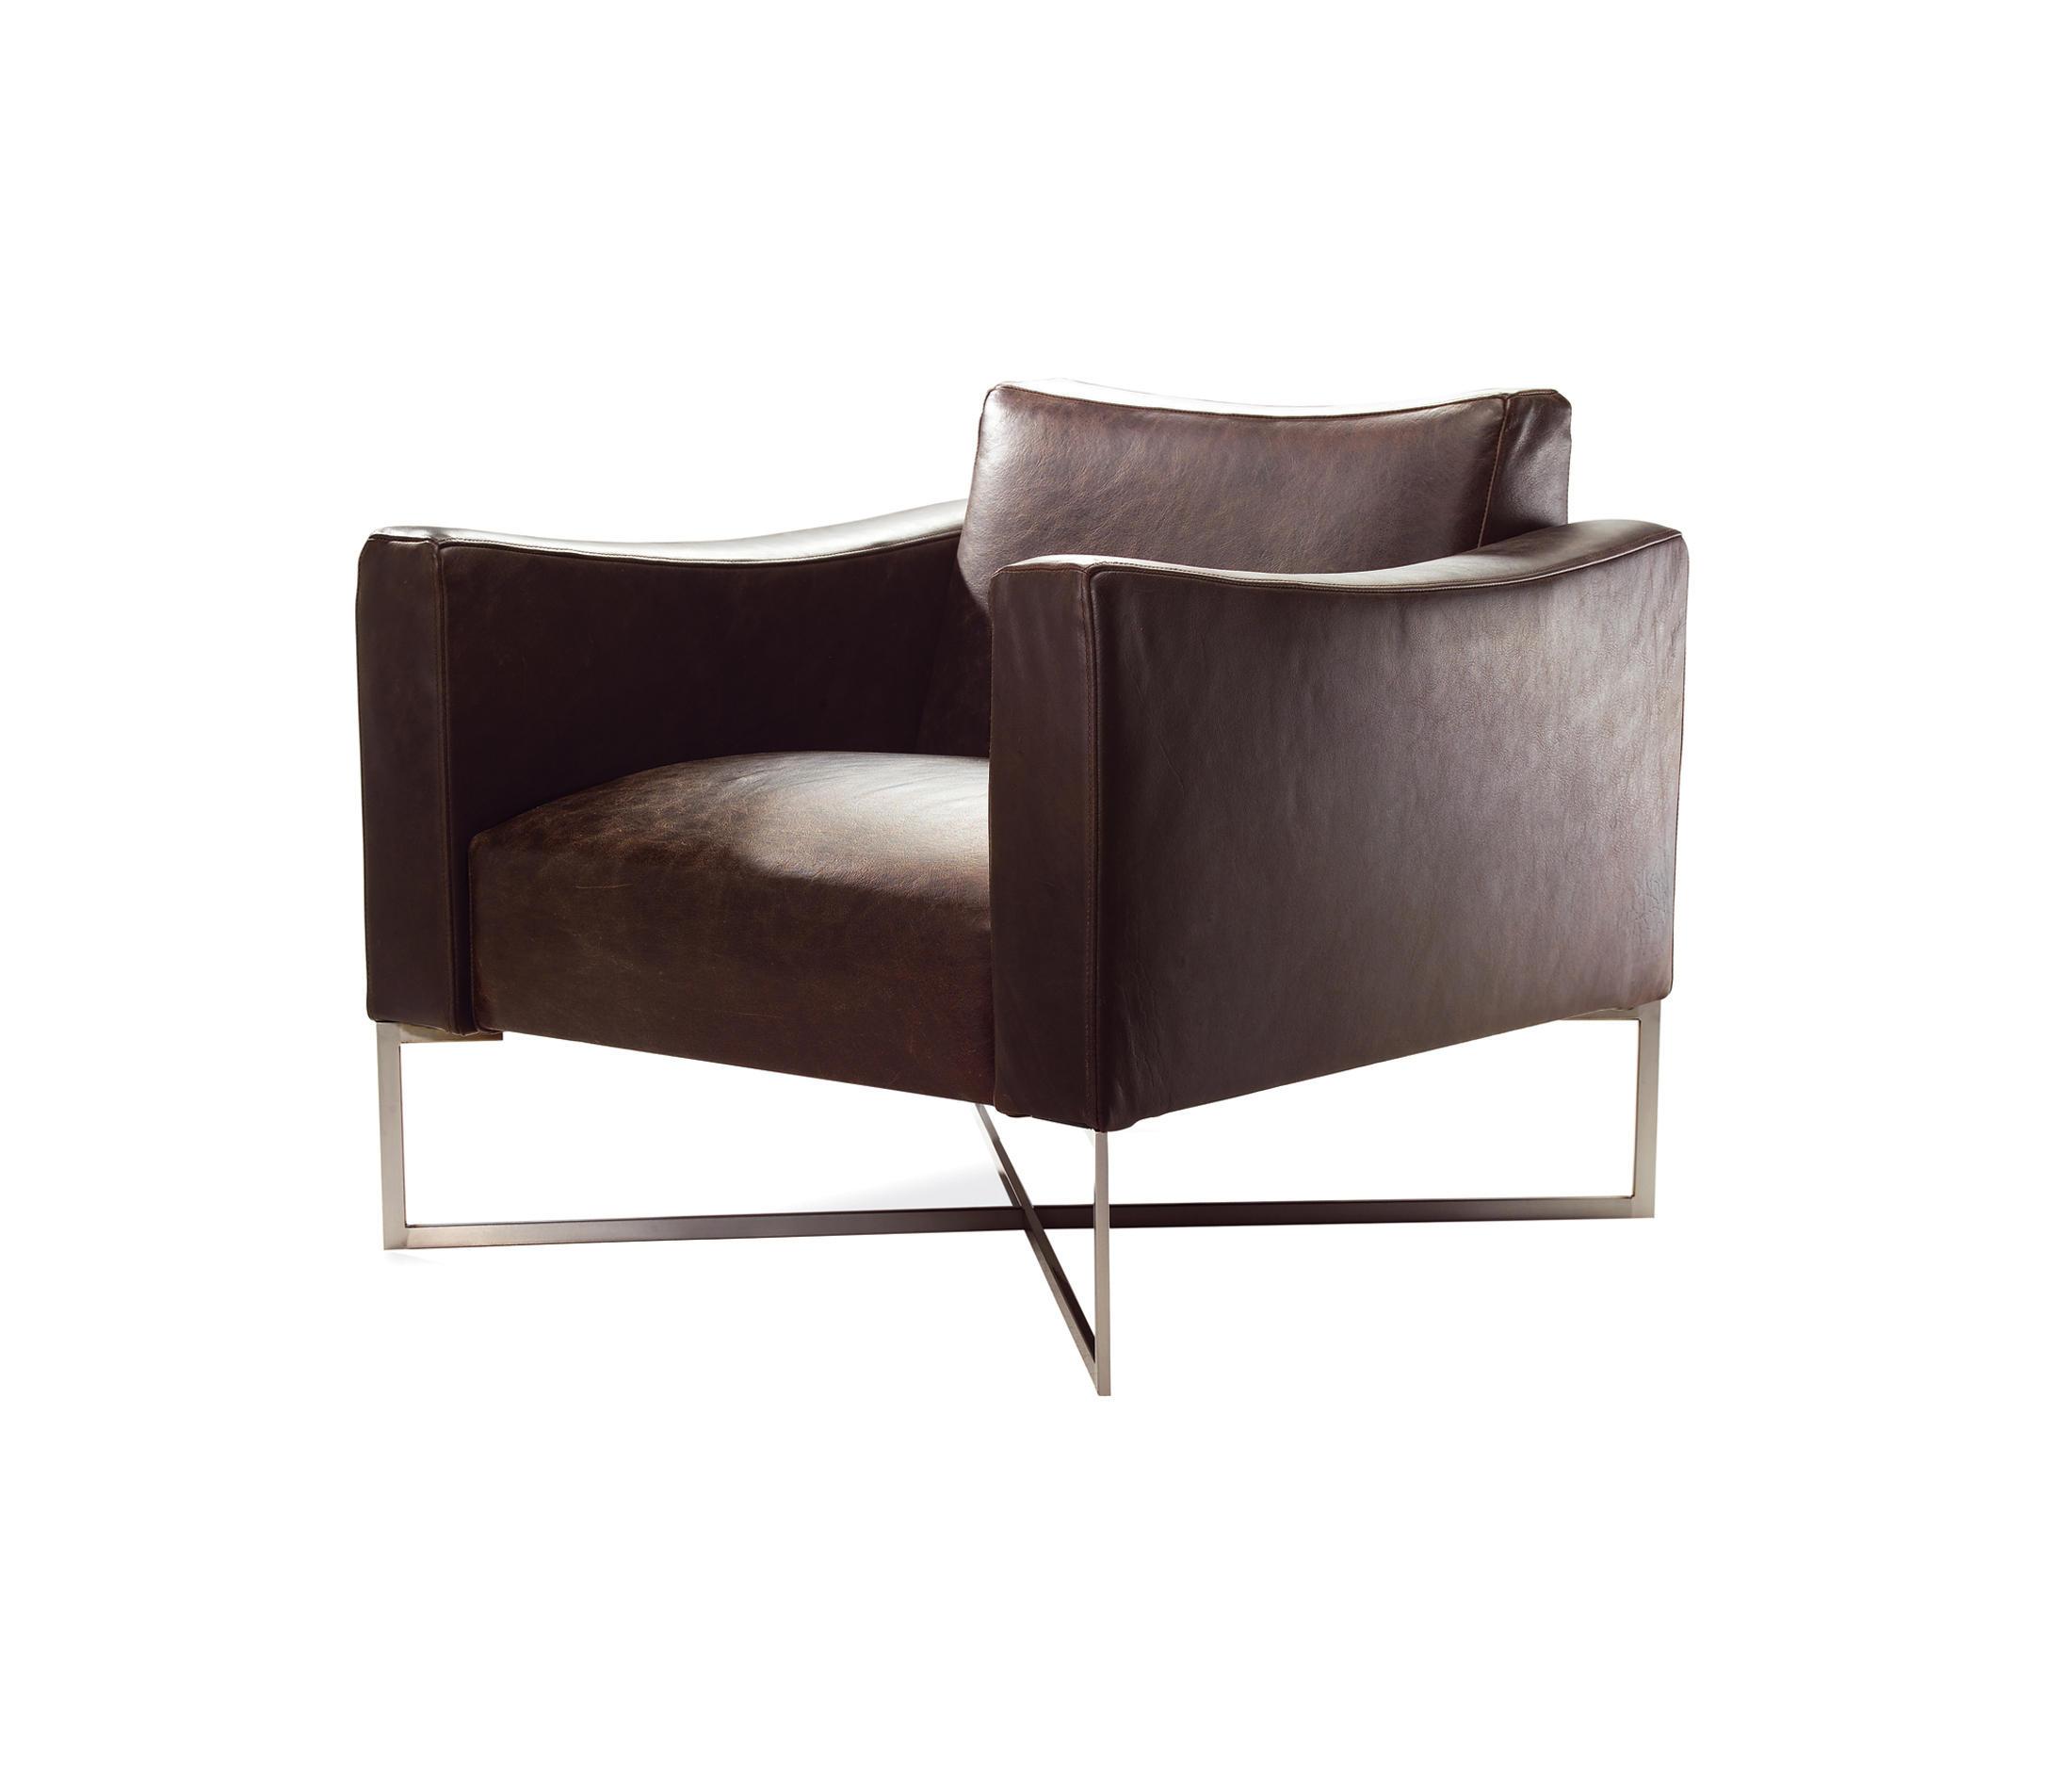 luis sessel loungesessel von kff architonic. Black Bedroom Furniture Sets. Home Design Ideas